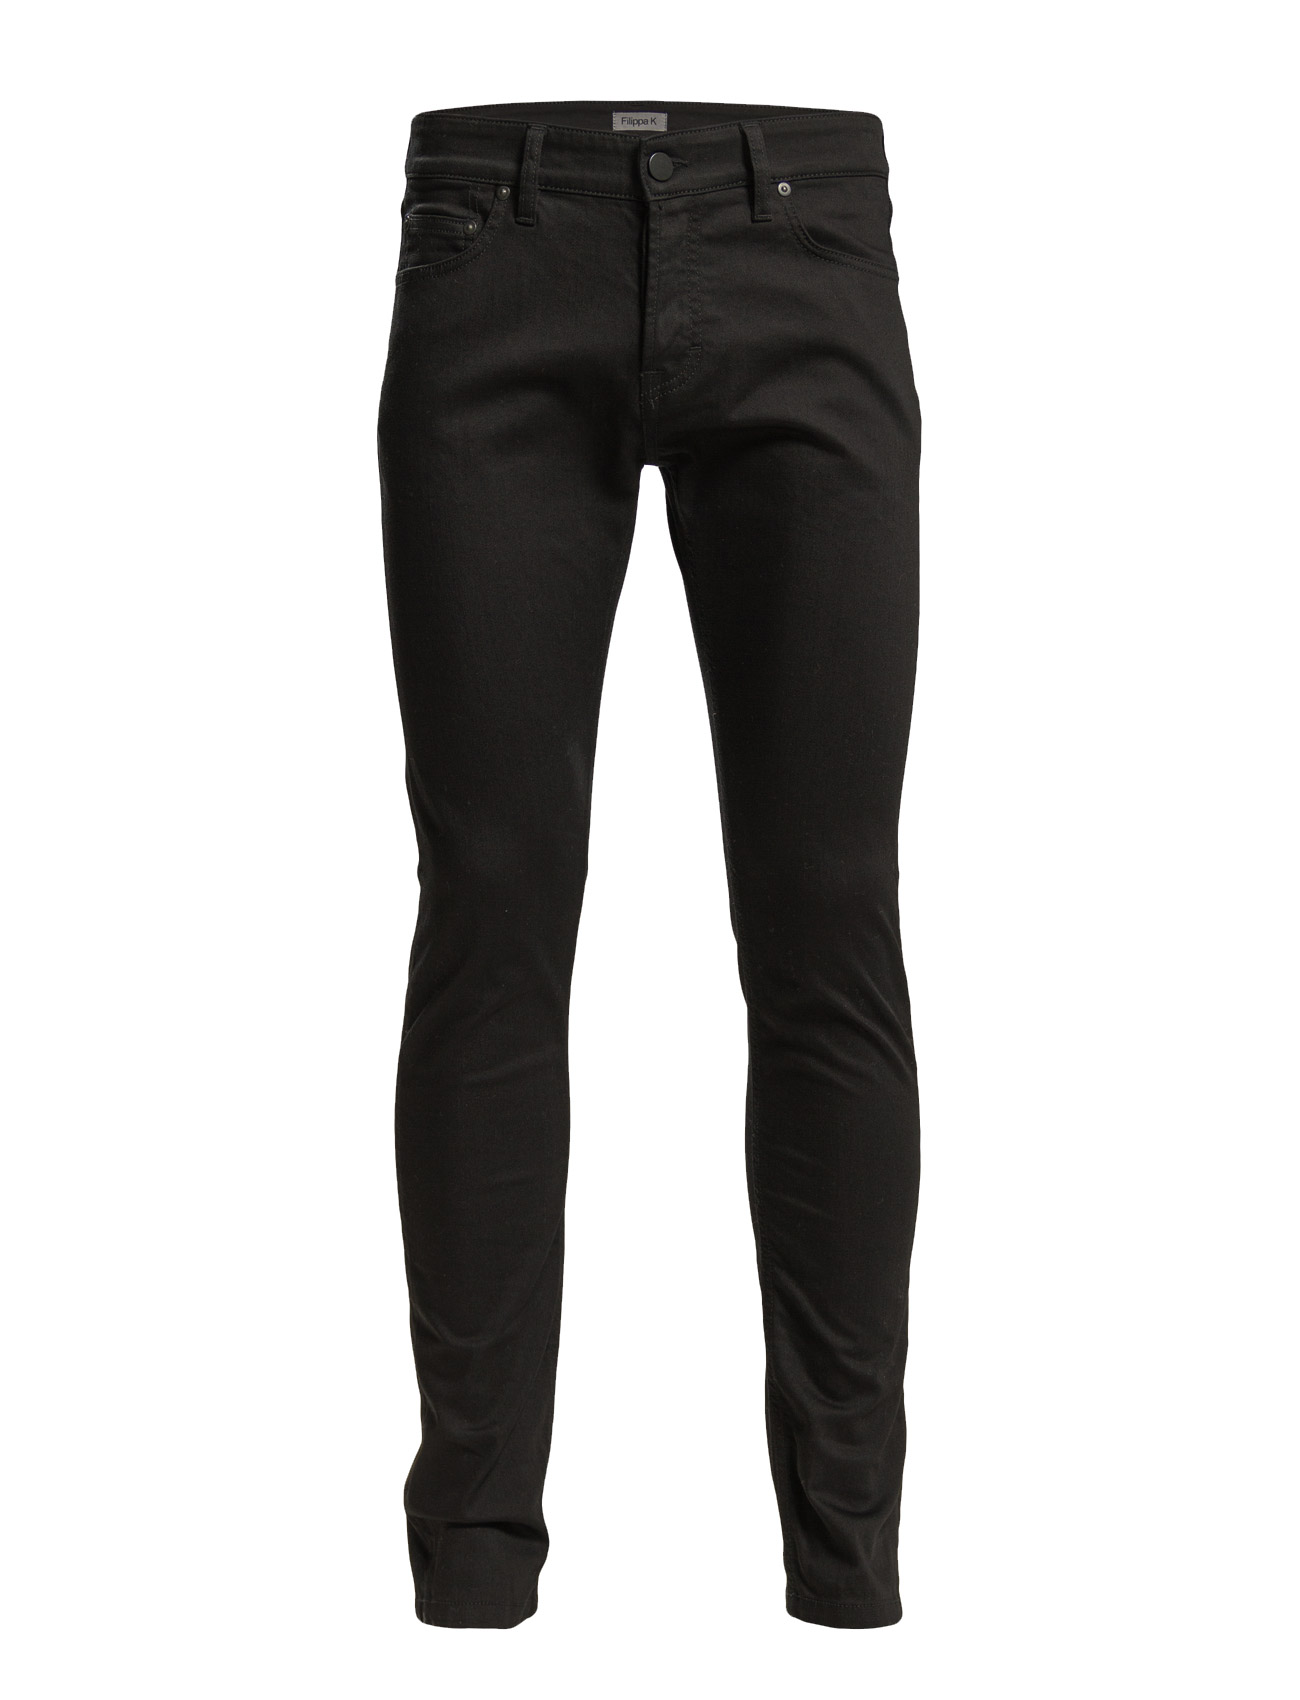 Filippa K M. Stan Ultra Black Jeans - BLACK